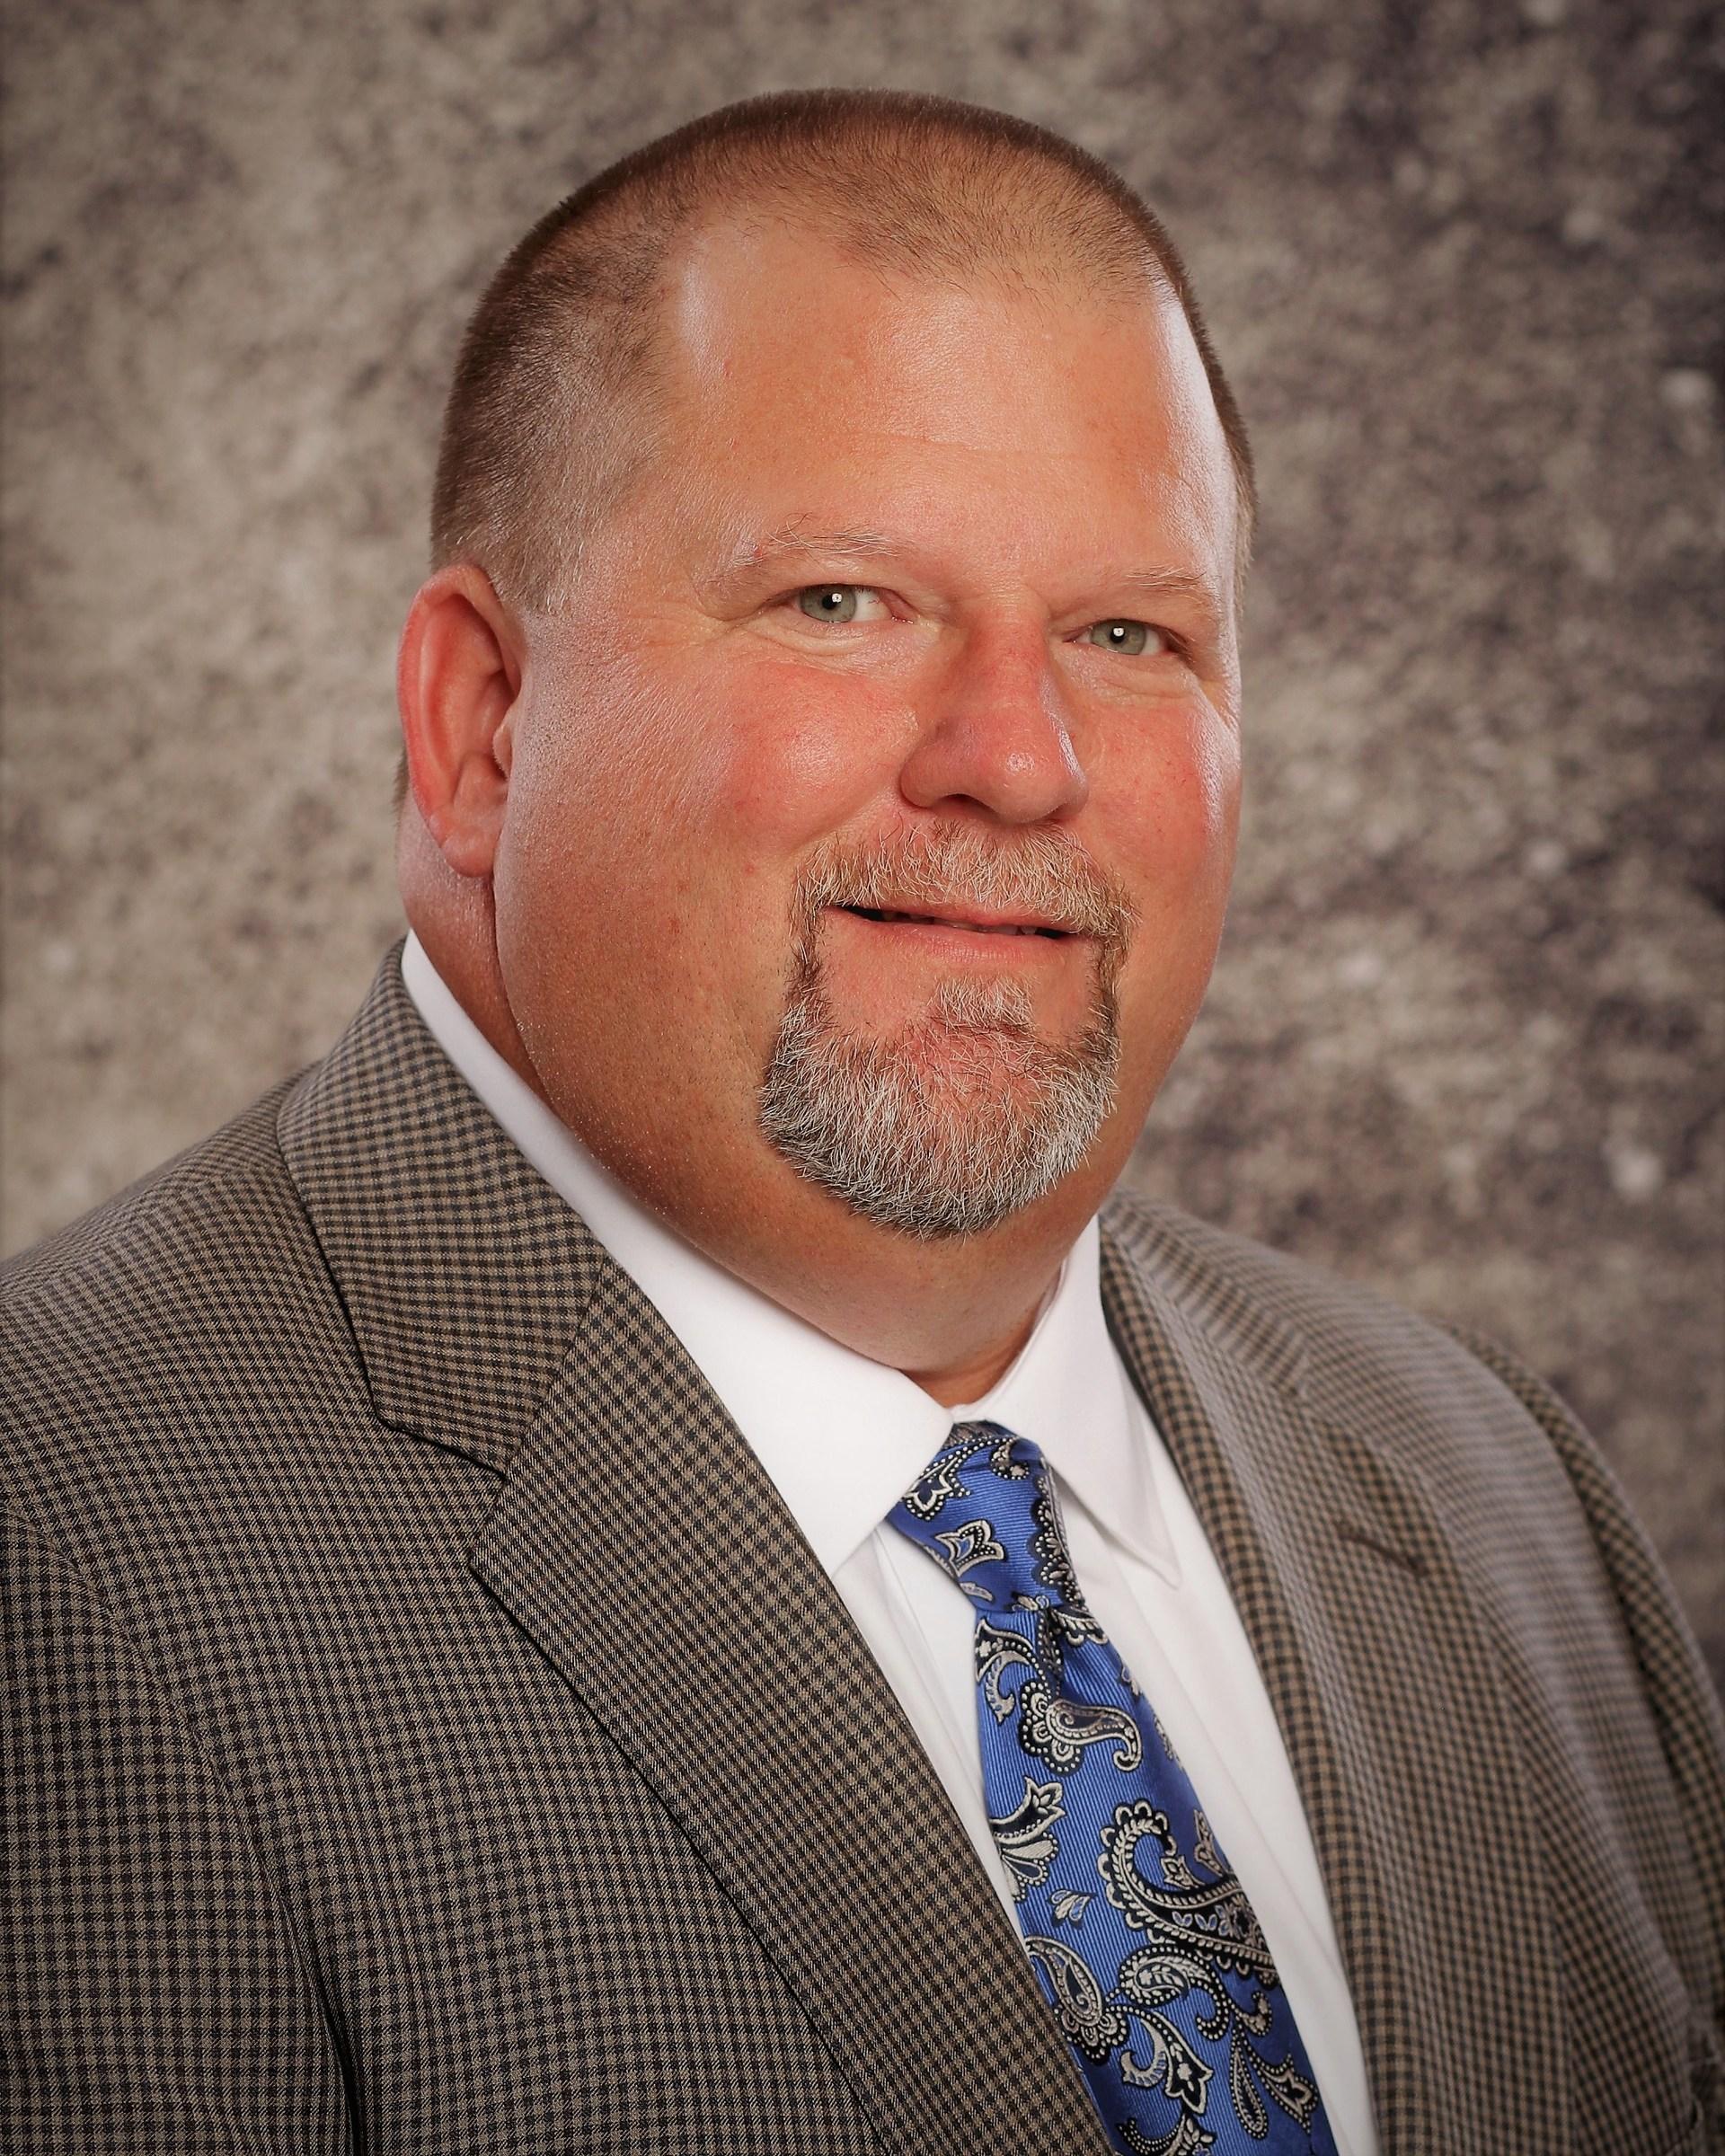 Jeff Linnstaedter, Chief Financial Officer